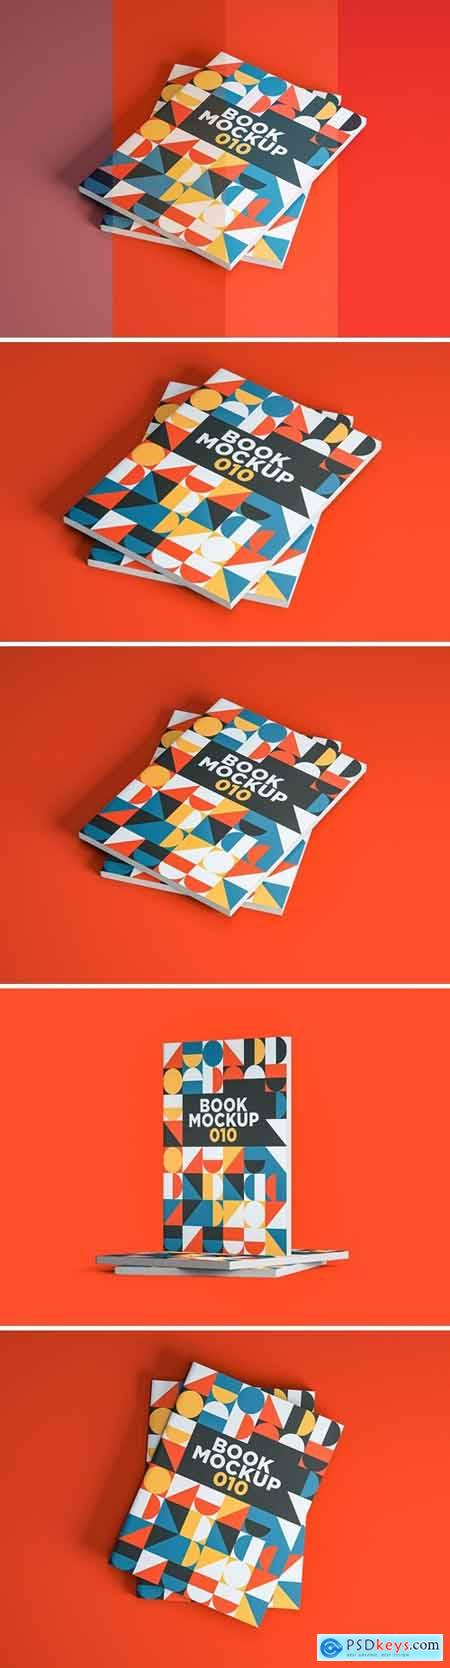 Book Mockup 010